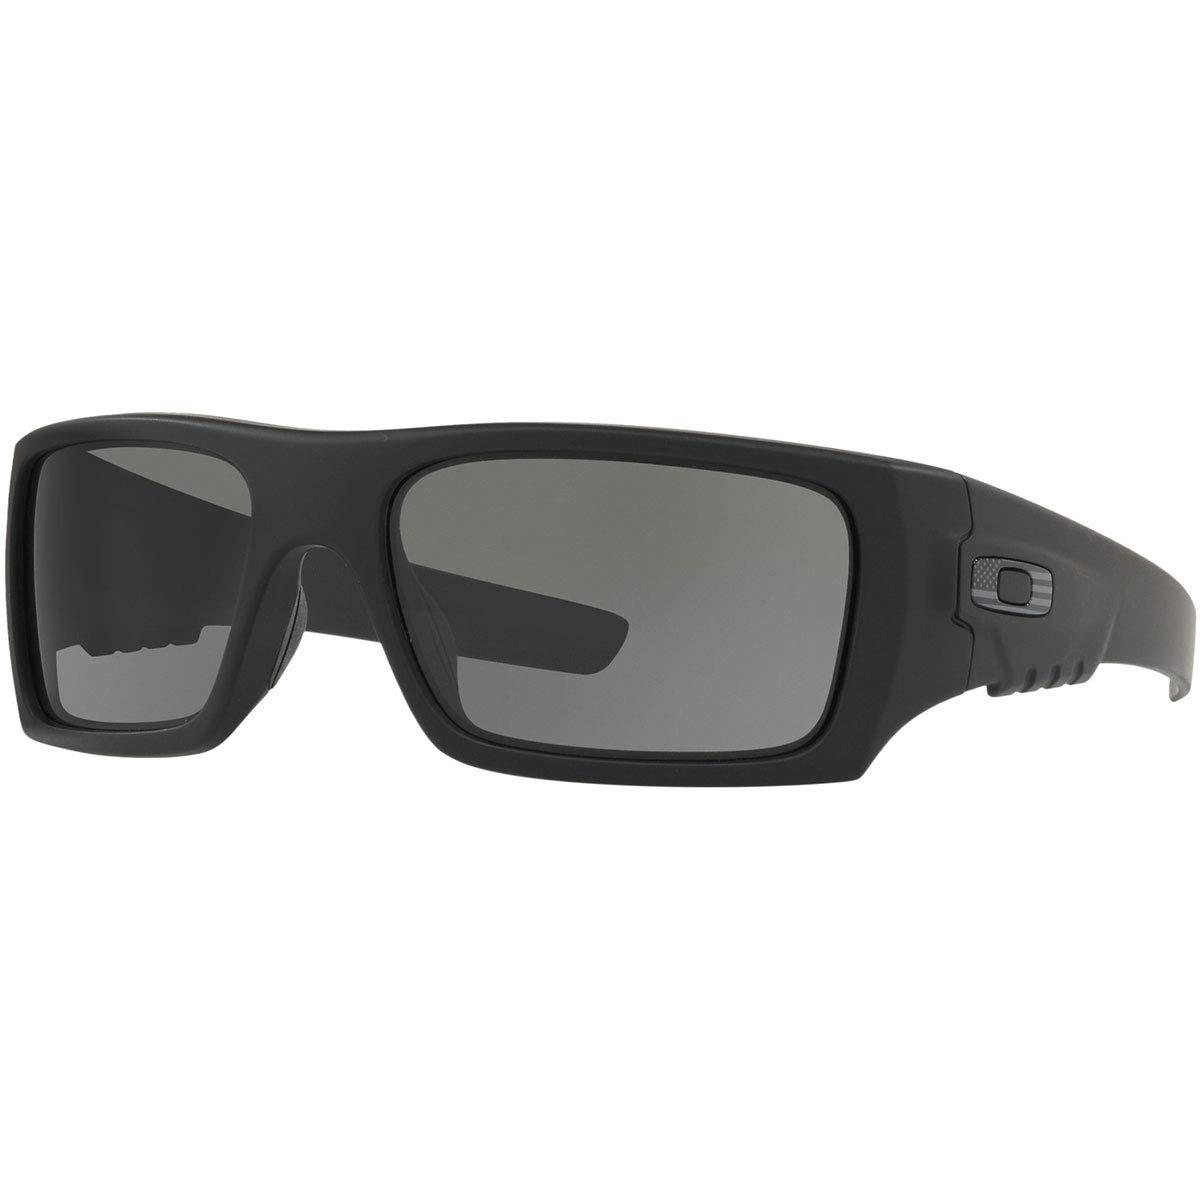 Sunglasses Flagoo9253 Black Oakley Det Cord 11 Usa Matte 2DHYIE9W